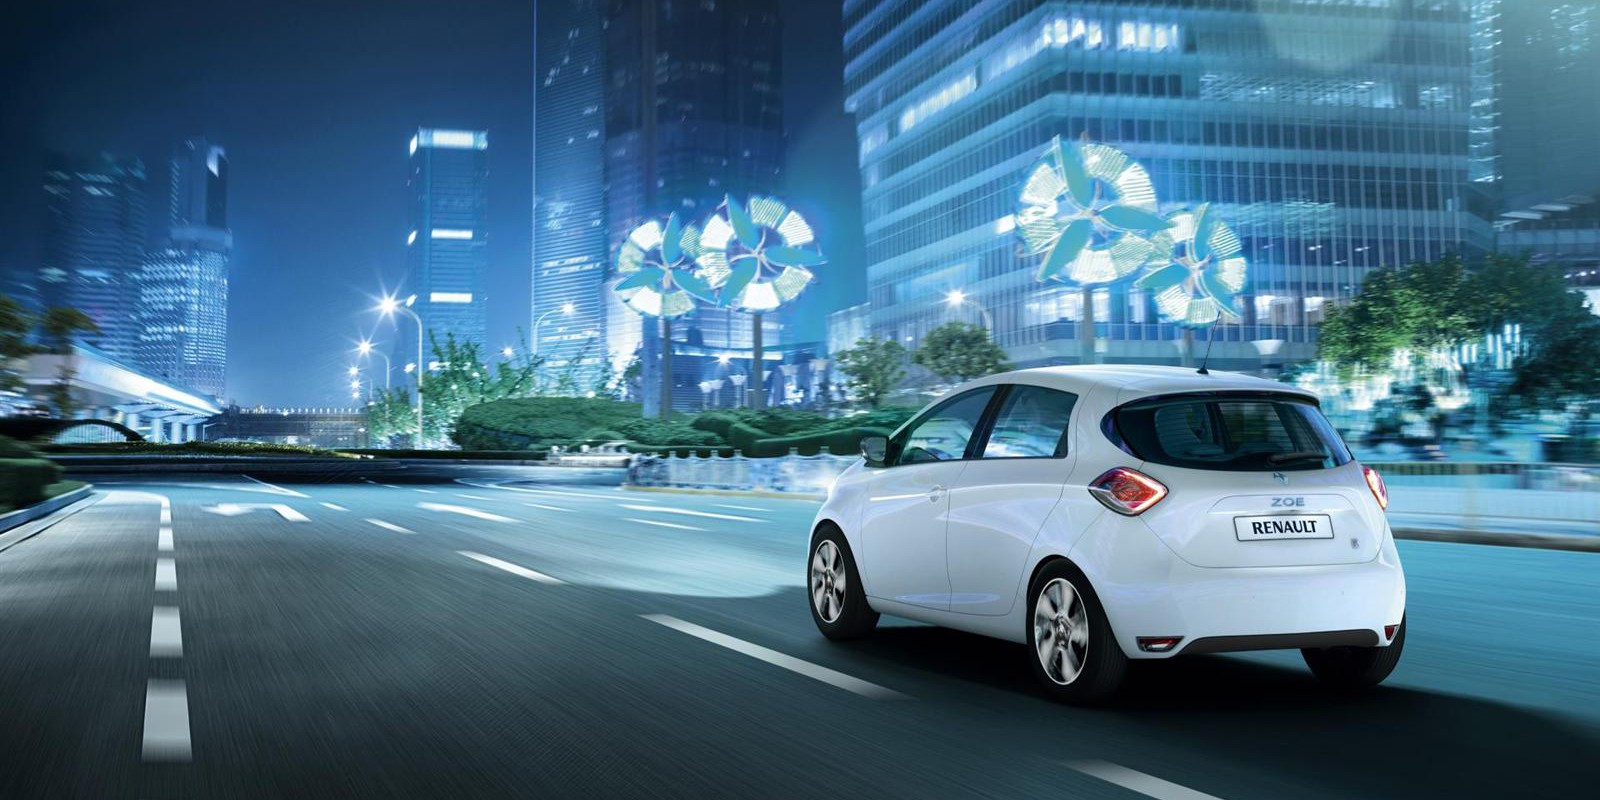 2013-Renault-ZOE_Image-014-1600